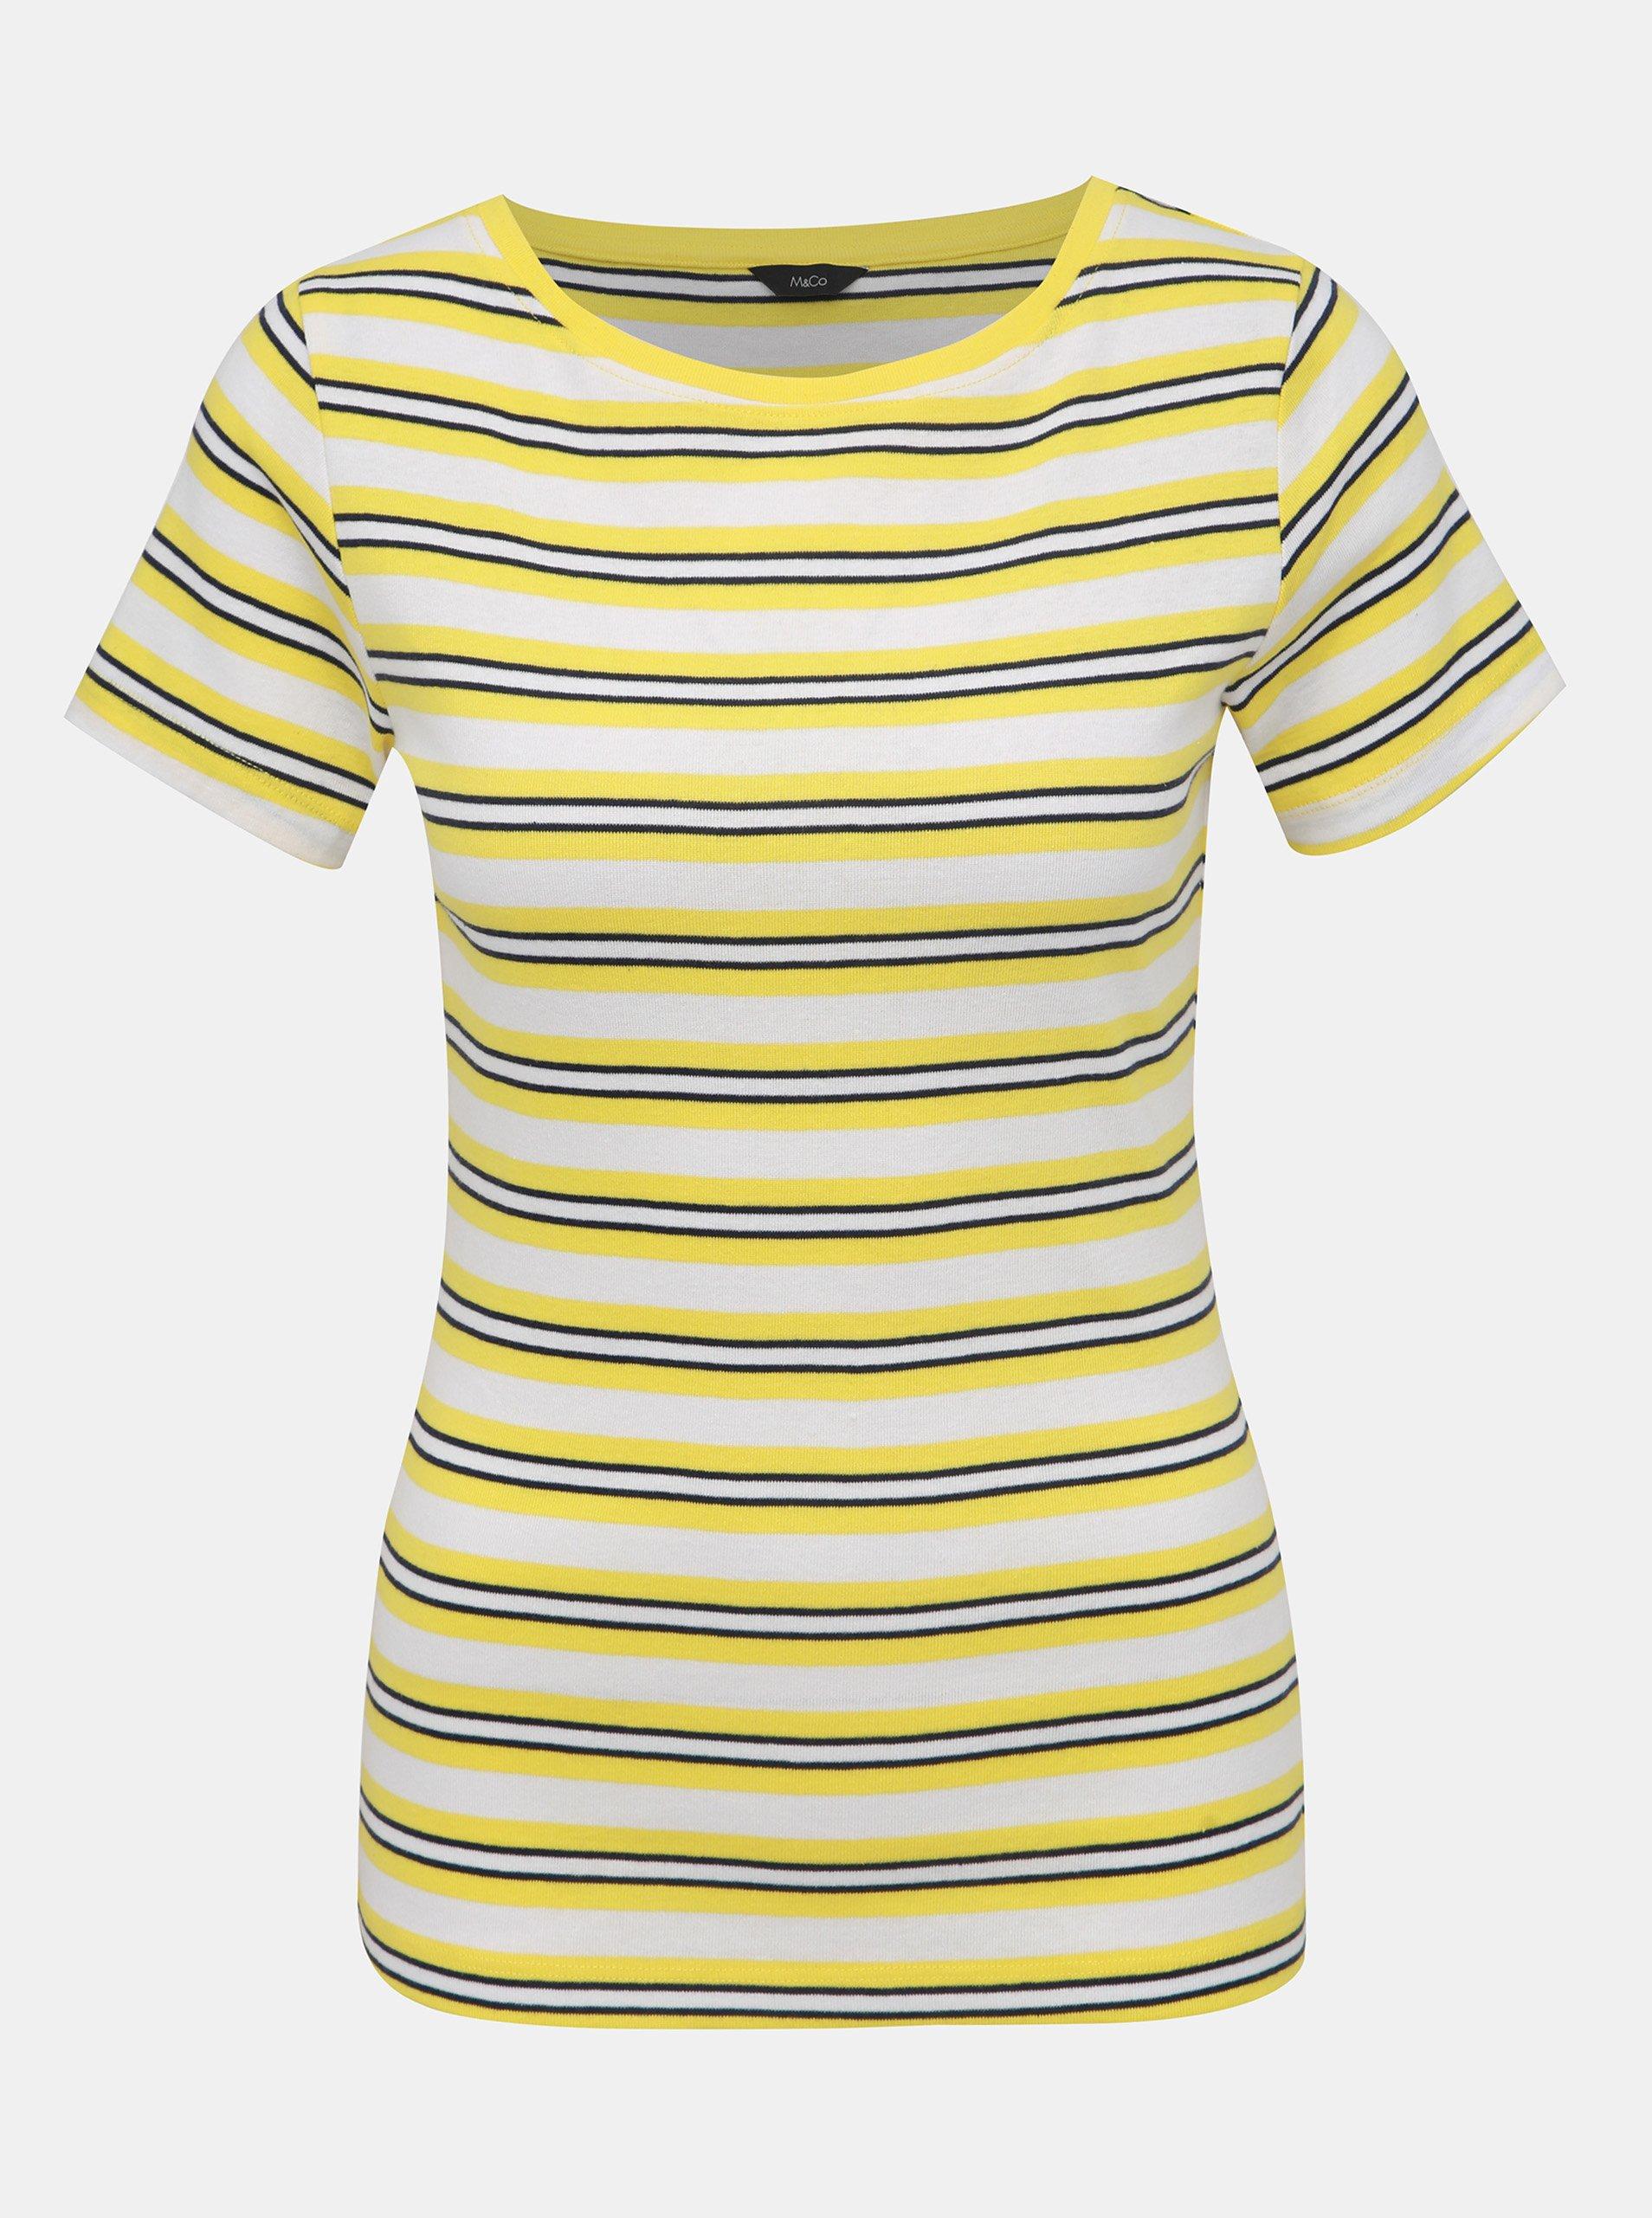 Žlto-biele dámske pruhované tričko M&Co